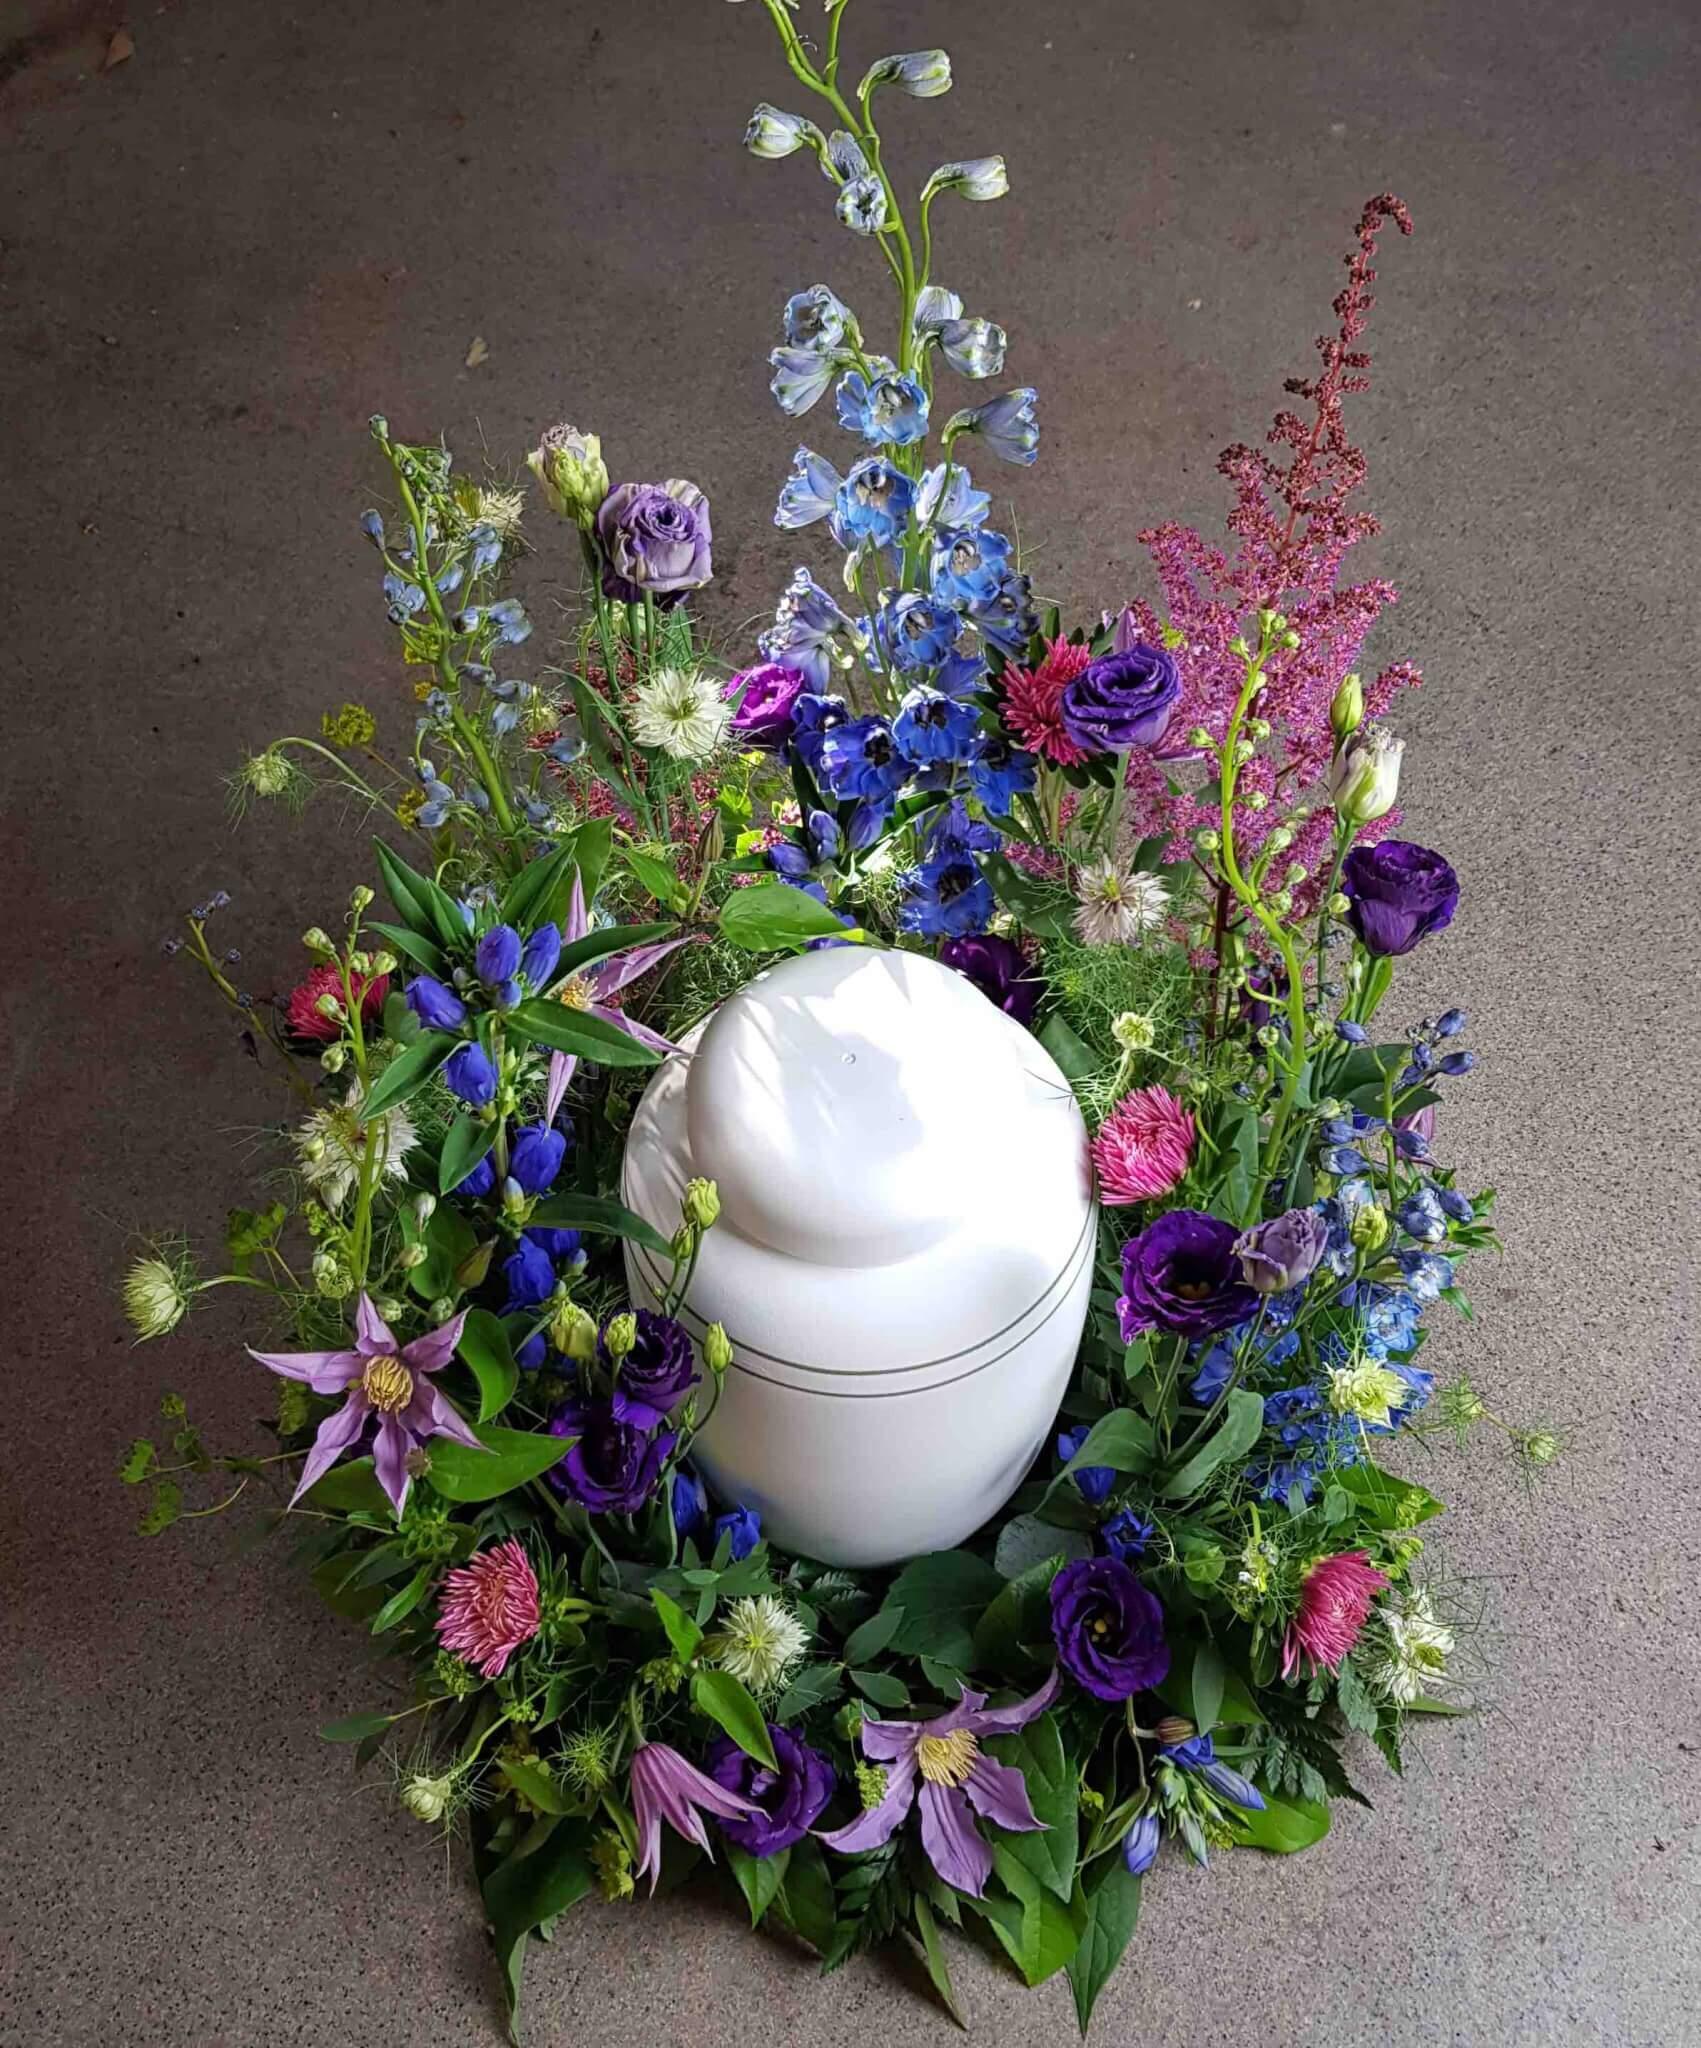 begravning med urna